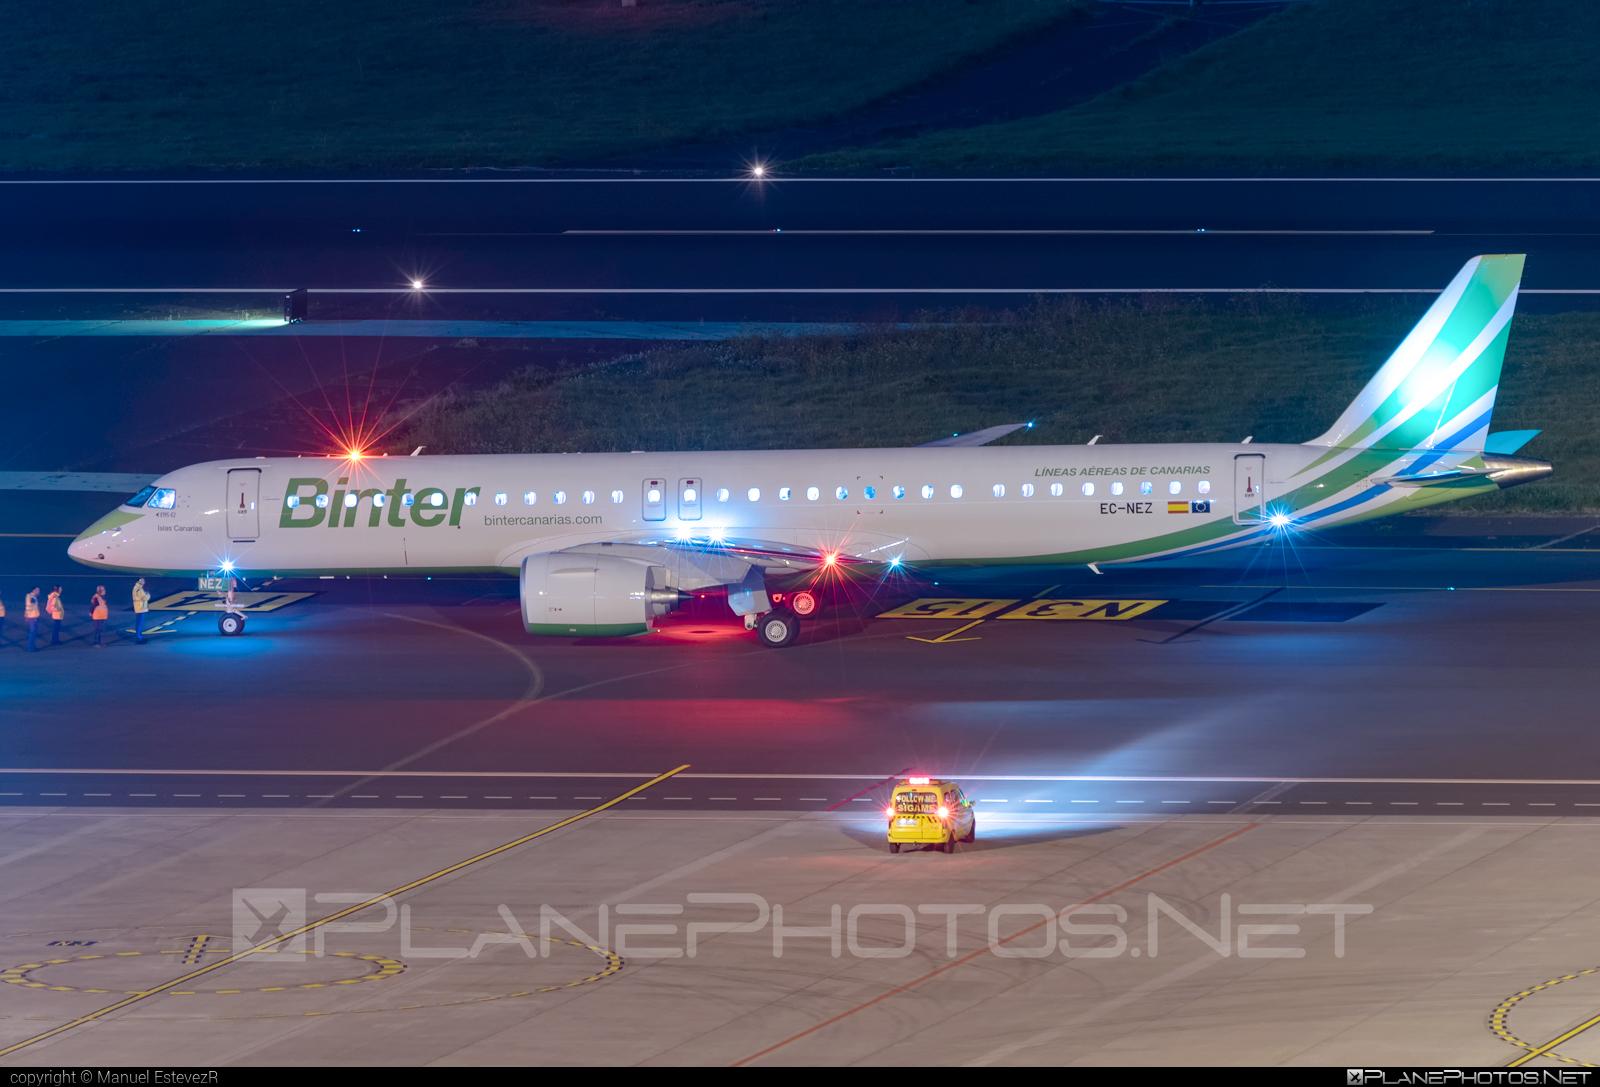 Embraer E195-E2 (ERJ-190-400STD) - EC-NEZ operated by Binter Canarias #e195 #e195e2 #embraer #embraer190400 #embraer190400std #embraer195 #embraer195e2 #erj190400 #erj190400std